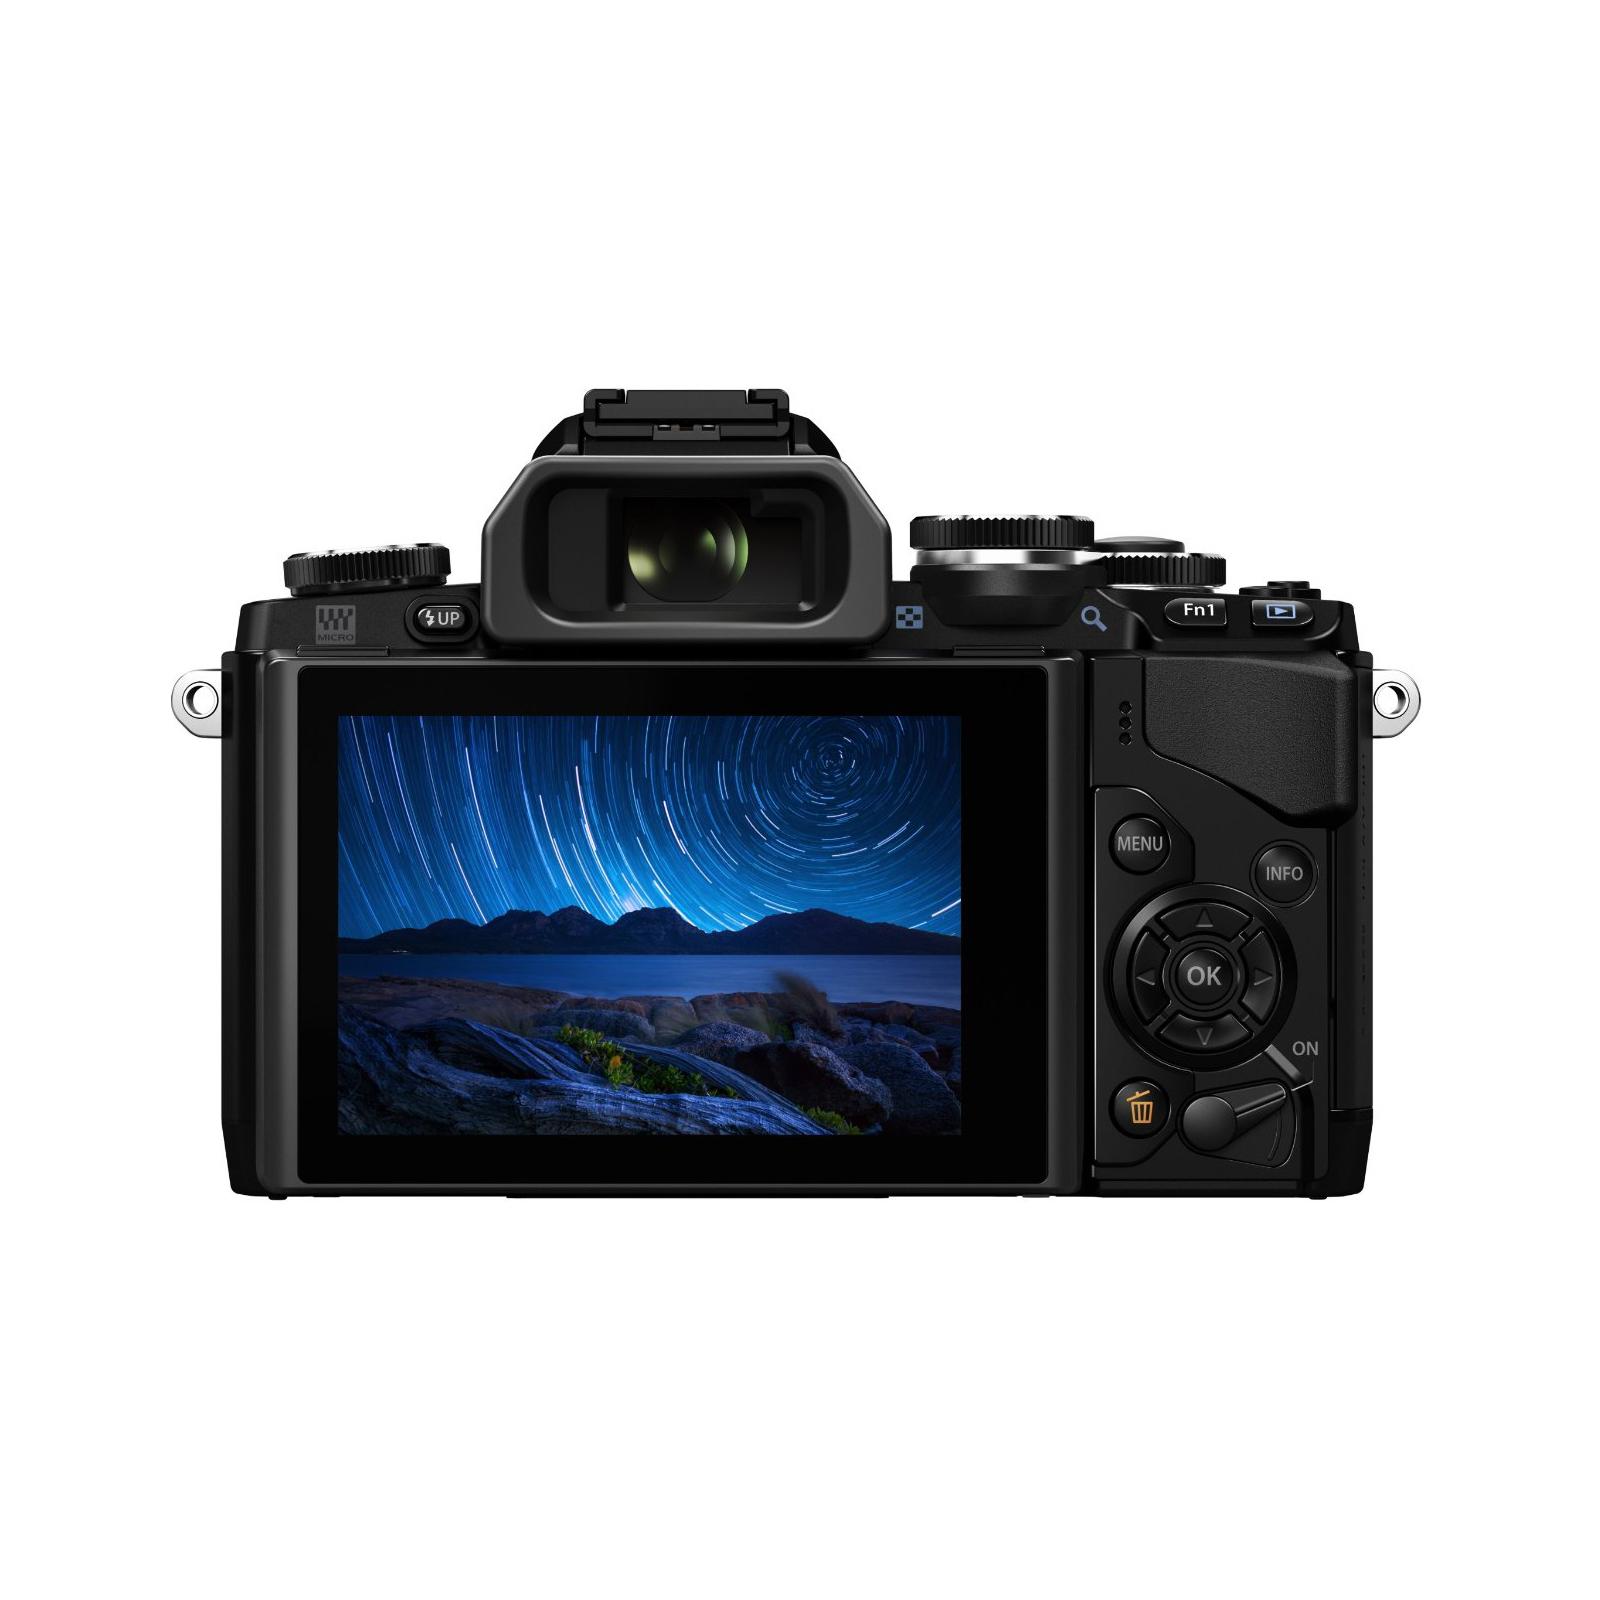 Цифровой фотоаппарат OLYMPUS E-M10 pancake zoom 14-42 Kit black/black (V207023BE000) изображение 3